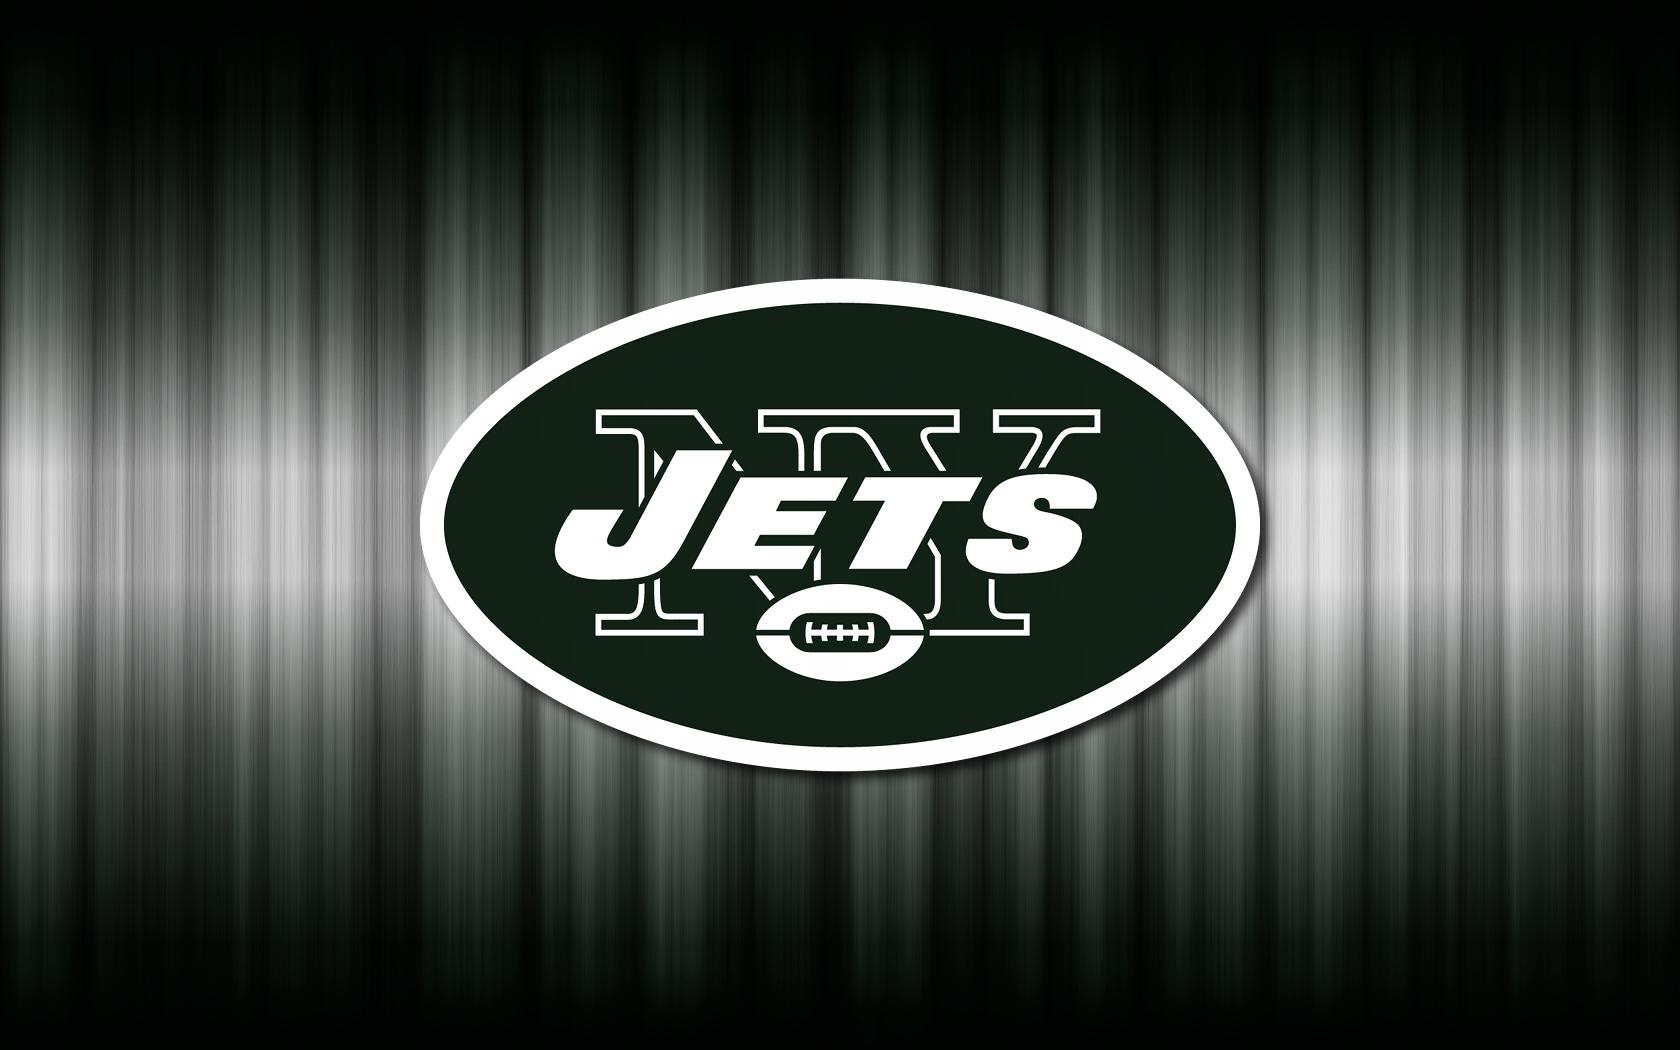 nfl logo new york jets wallpaper 2018 in football